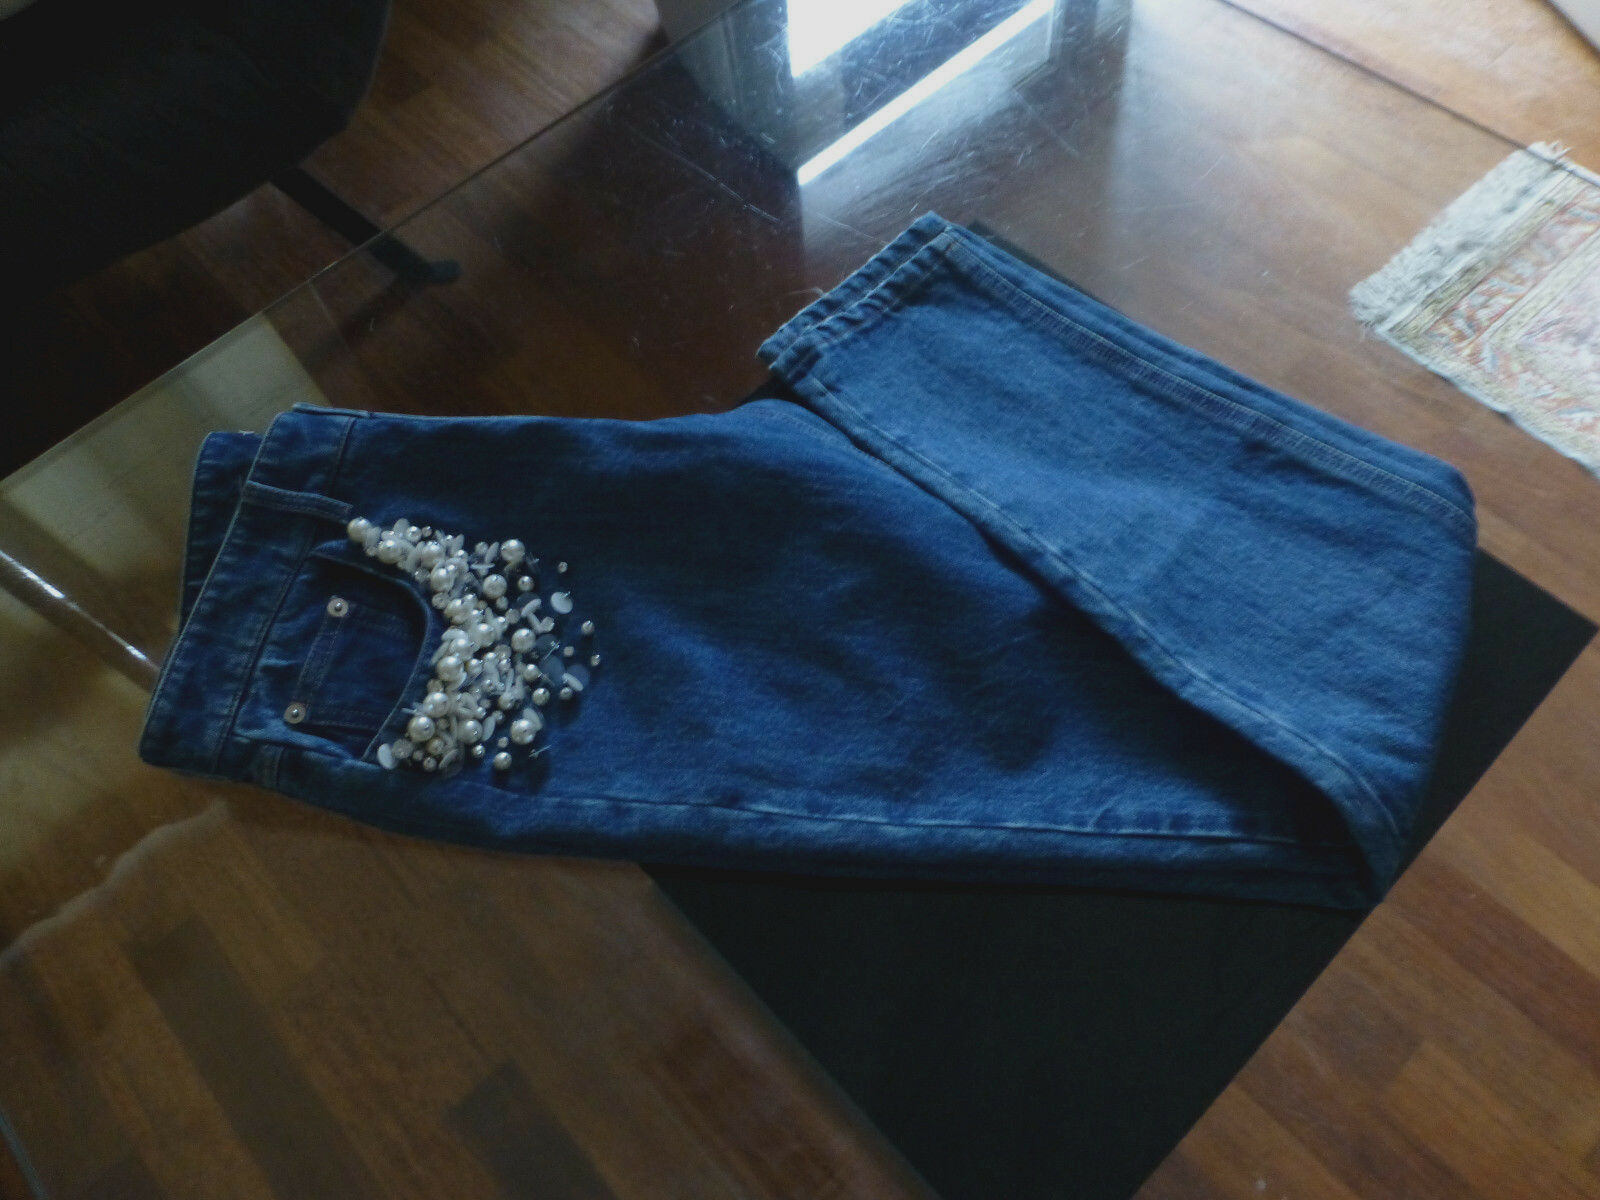 MIU MIU Jeans Pantaloni Con Perle